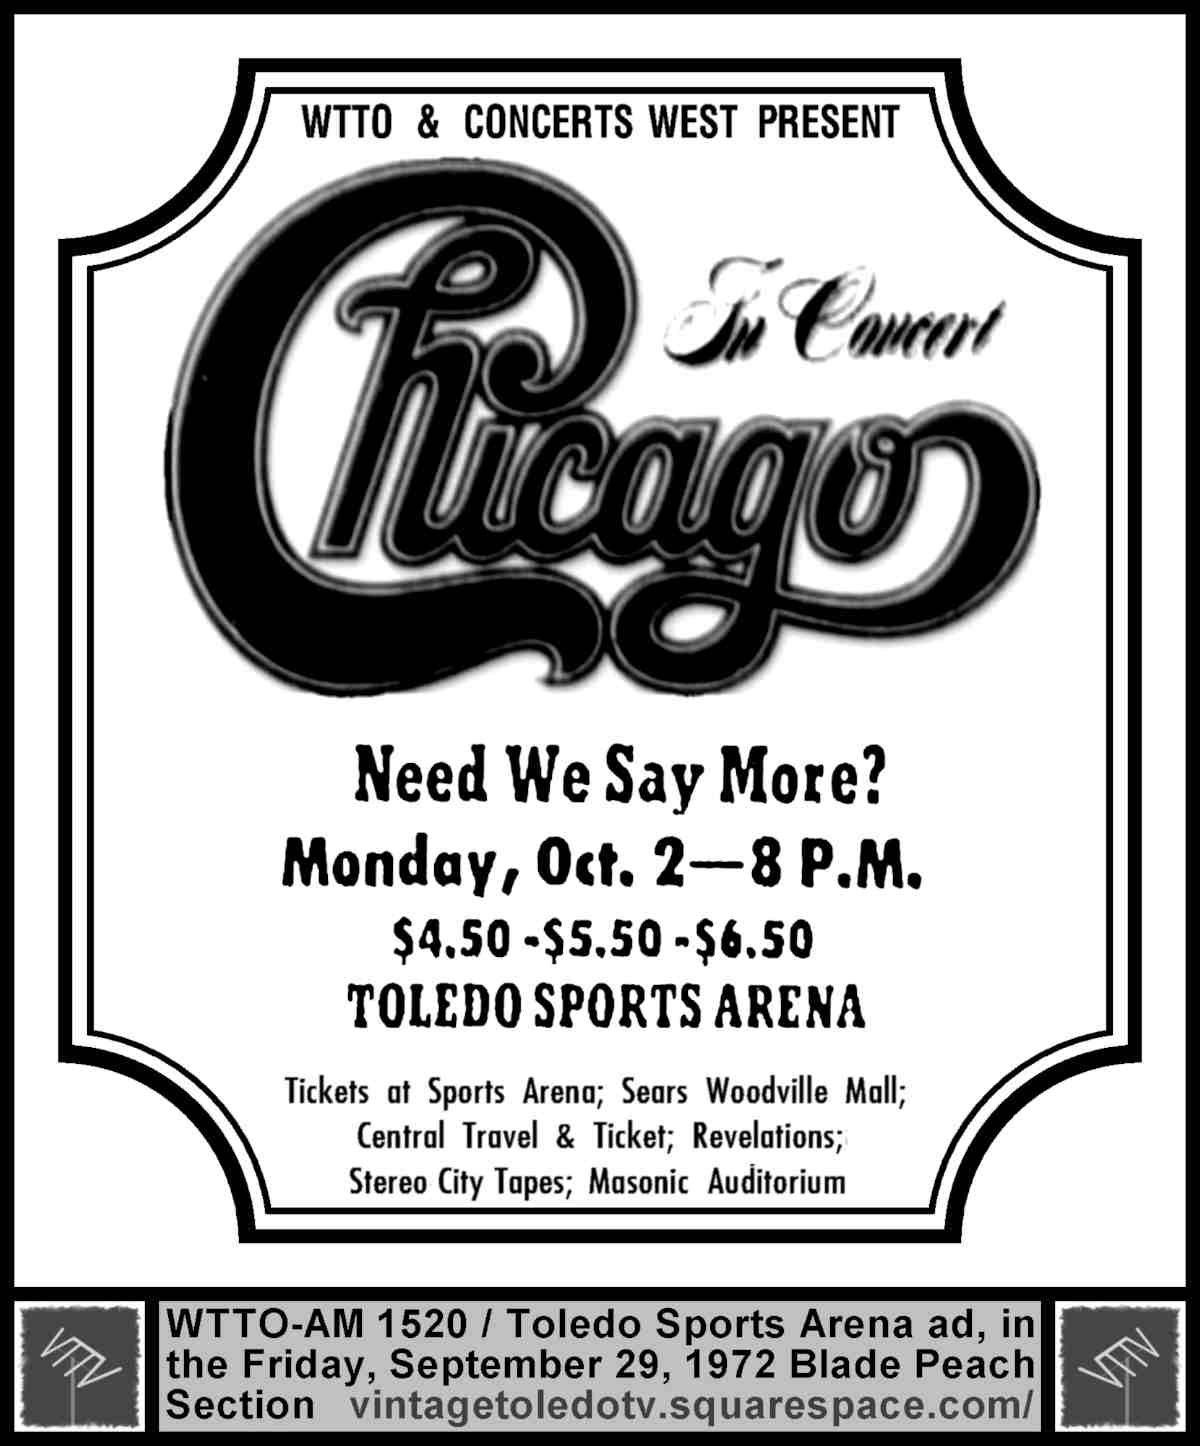 Vintage Toledo TV - Vintage Radio Station Print Ads - WTTO & Concerts West  present Chicago at Toledo Sports Arena (Fri 9/29/72 ad)